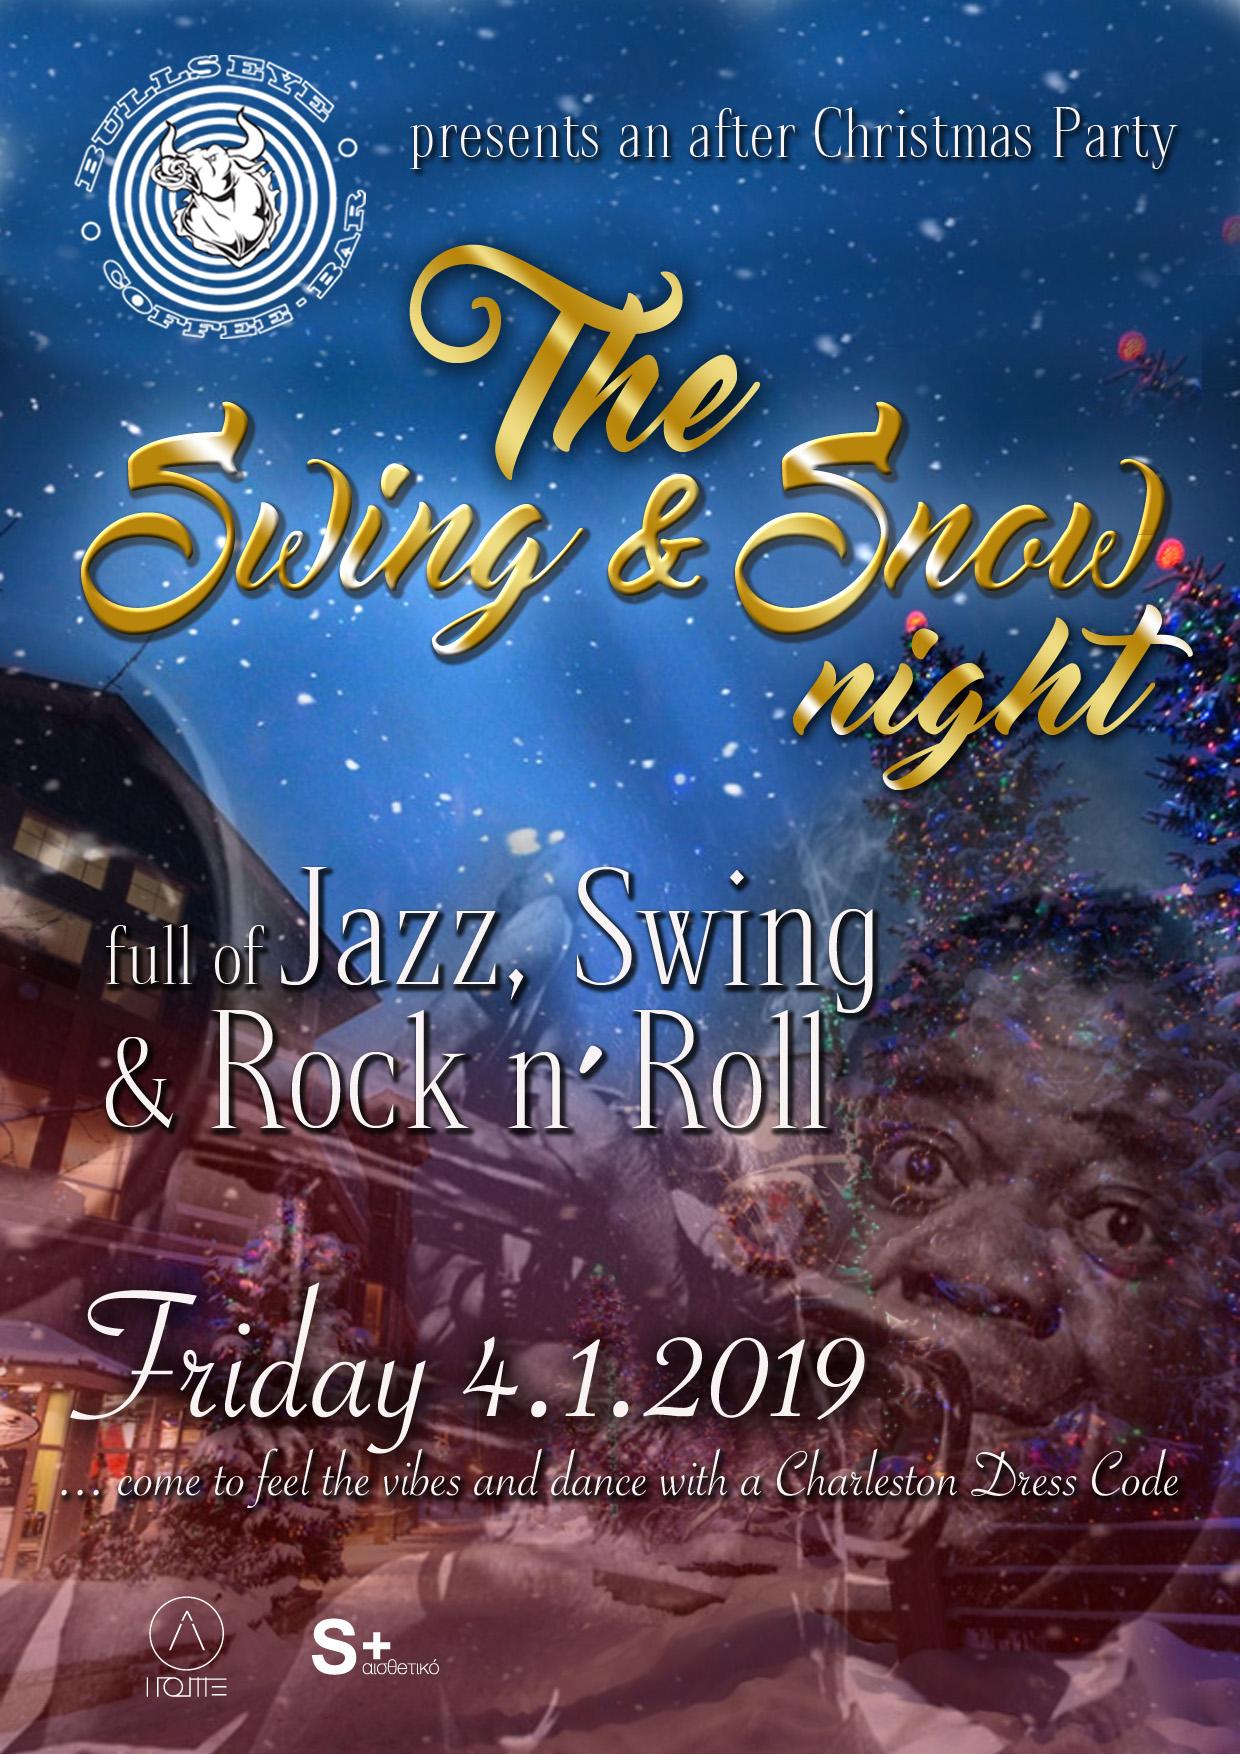 the swing & snow night